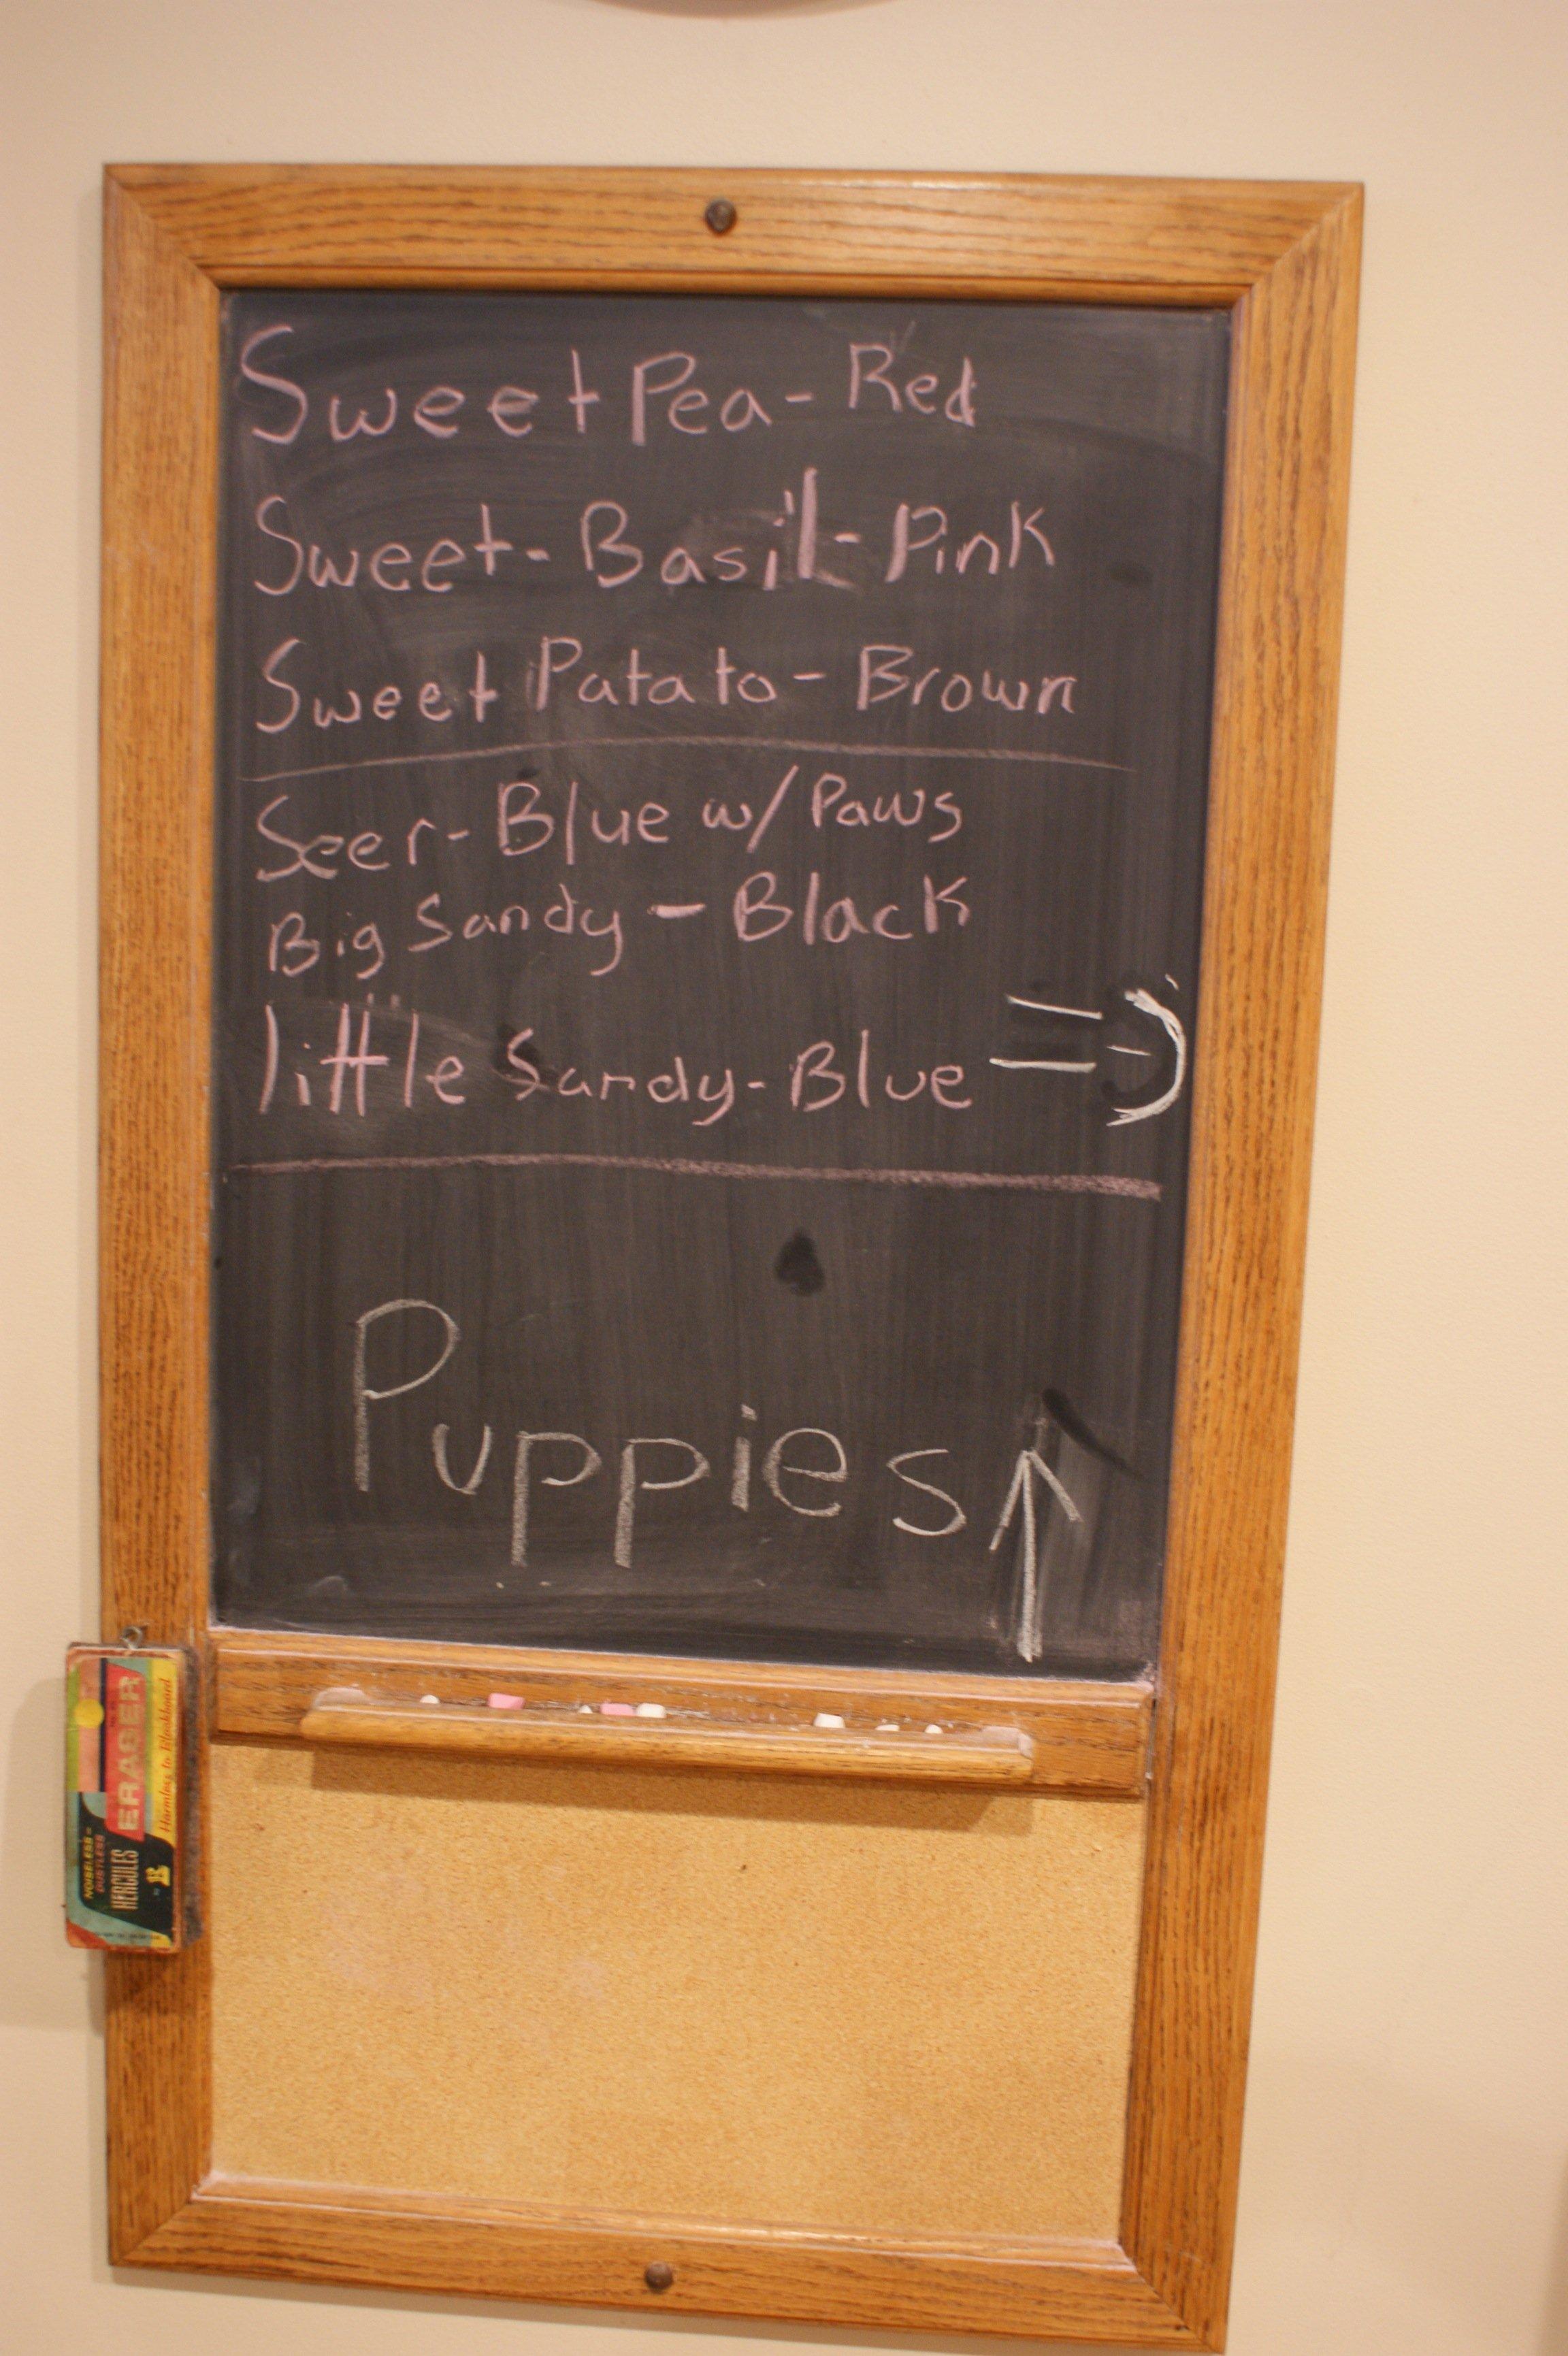 The puppy board